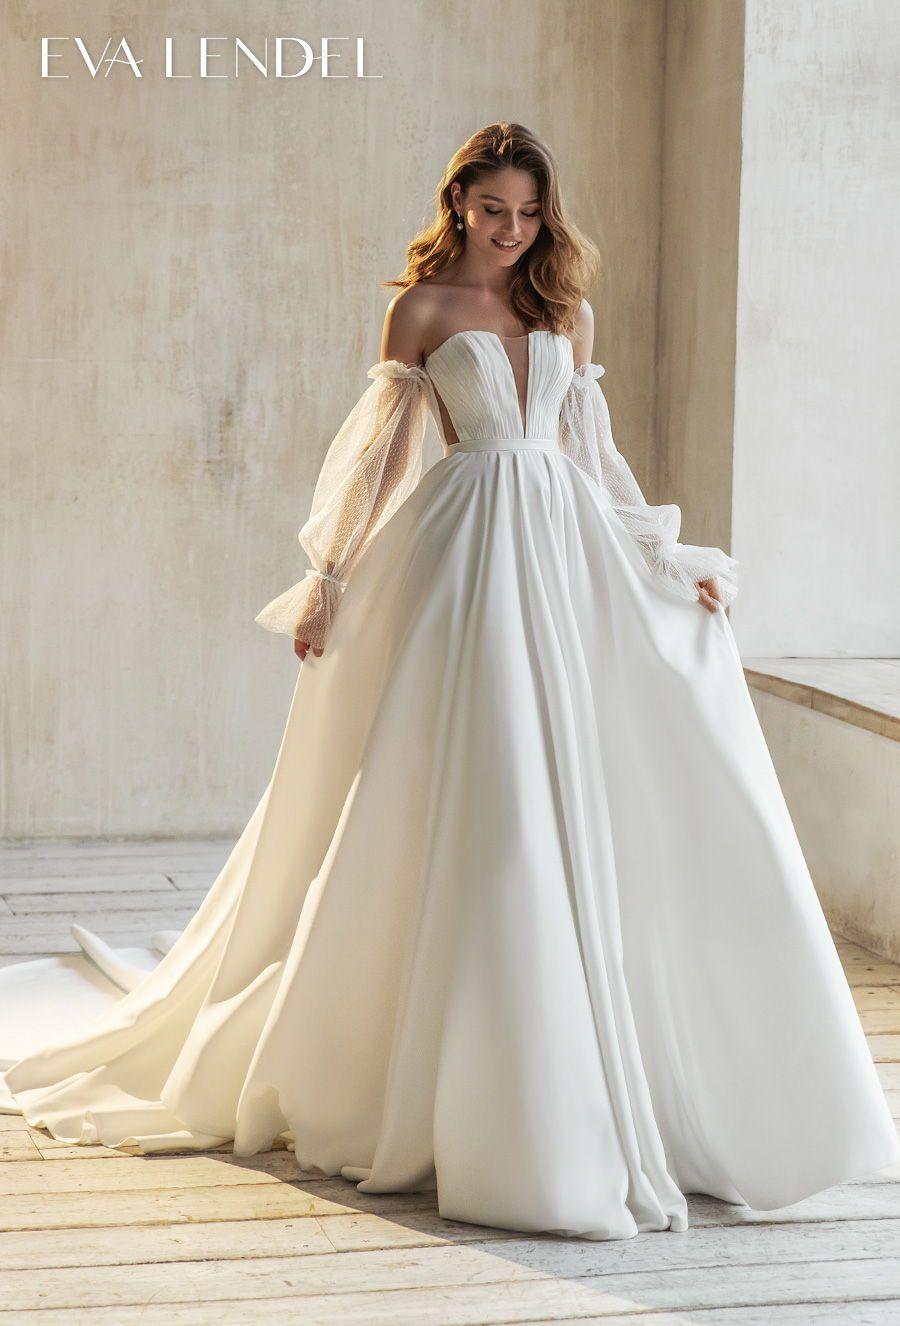 Eva Lendel 2021 Wedding Dresses Less Is More Bridal Collection Wedding Inspirasi Ball Gowns Wedding Wedding Dresses Fitted Wedding Dress [ 1326 x 900 Pixel ]